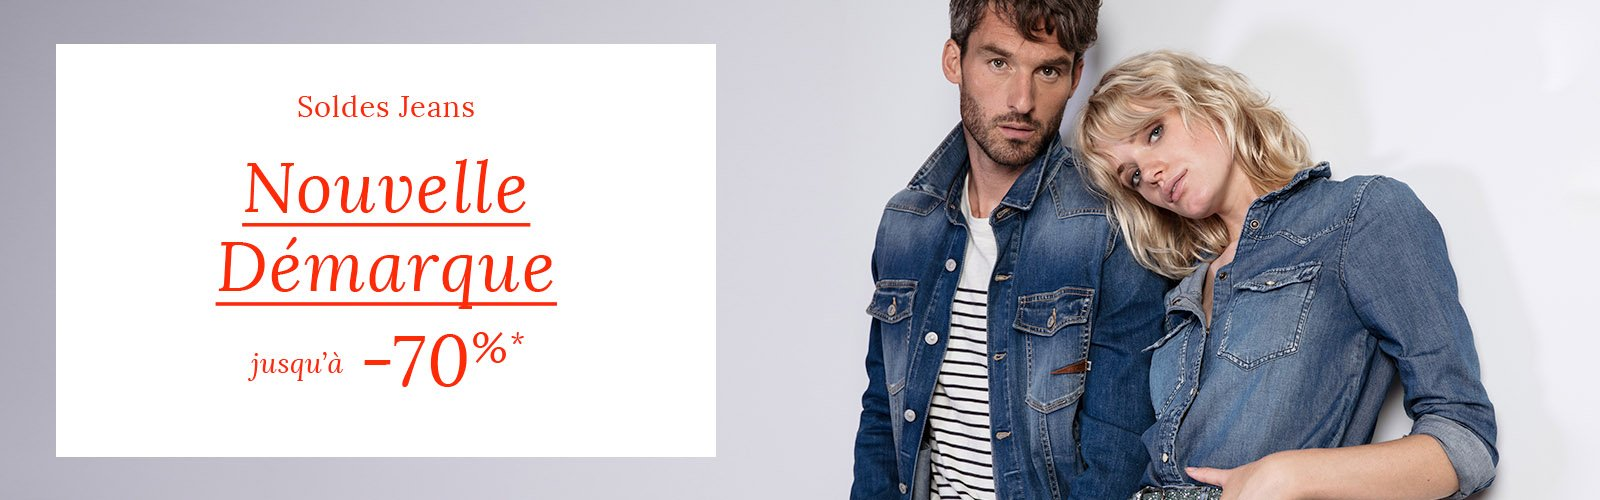 Soldes Jeans